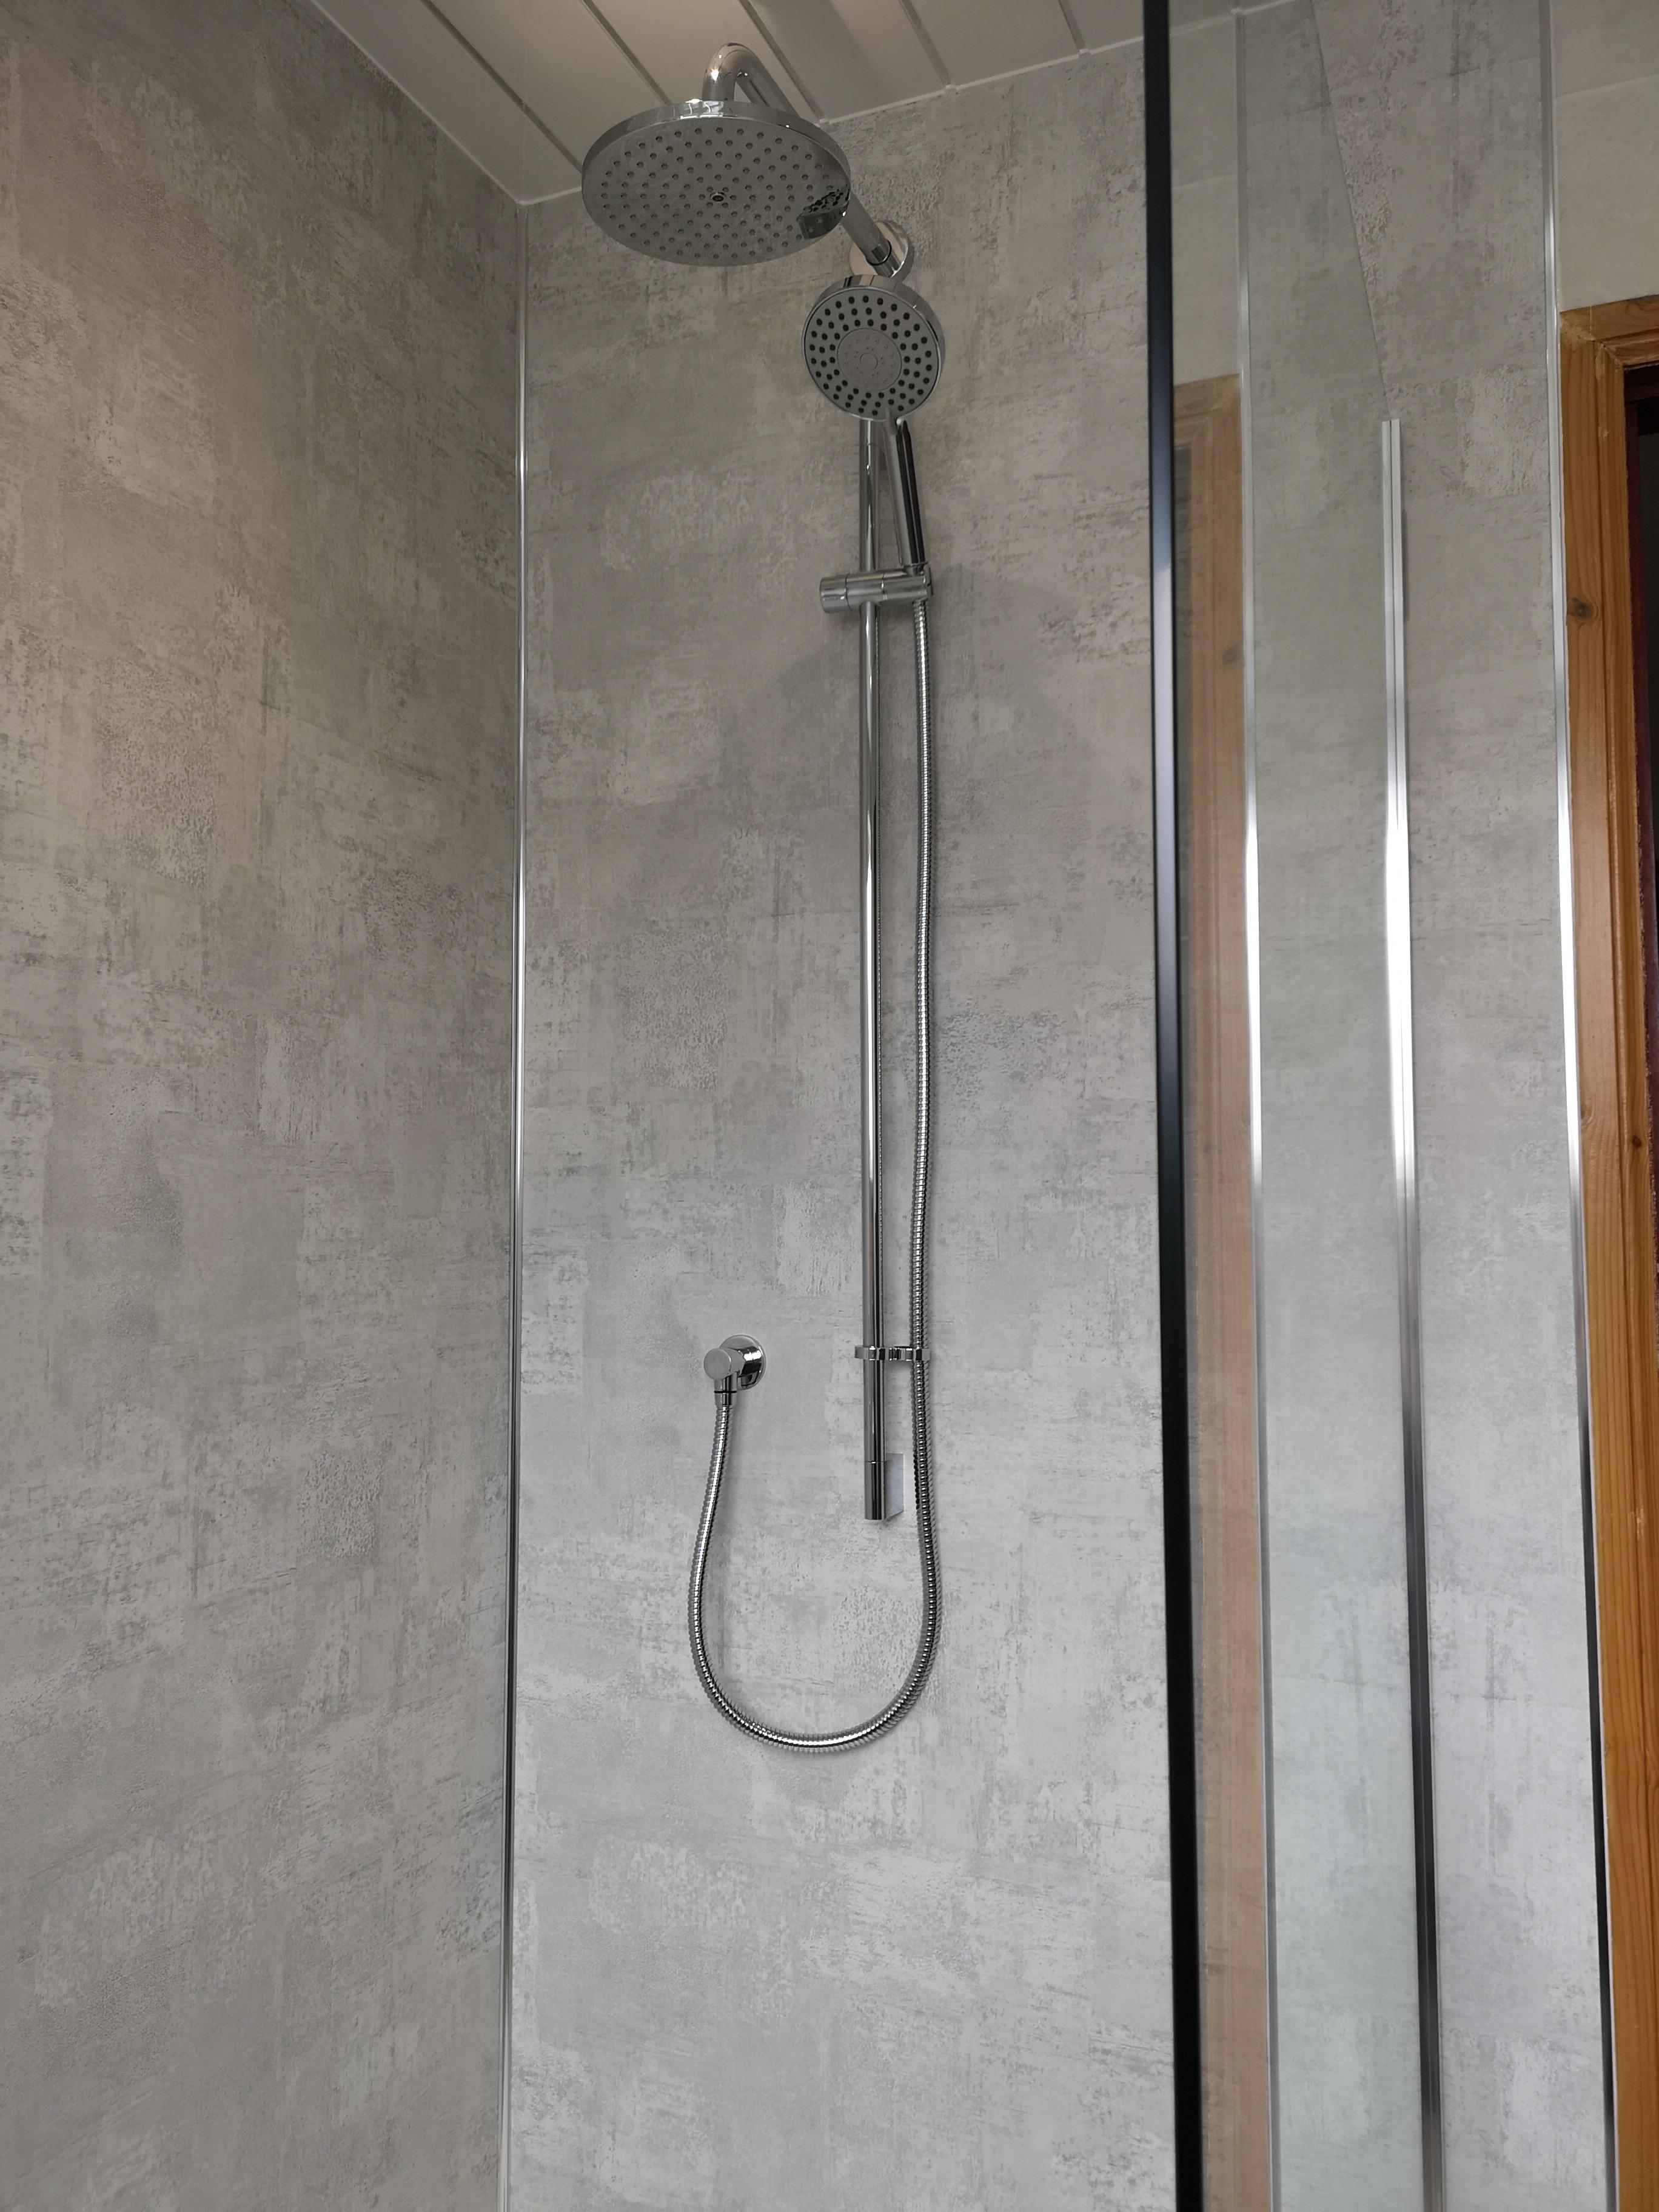 Grey Bathroom gloss wall and floor tiles with shower.